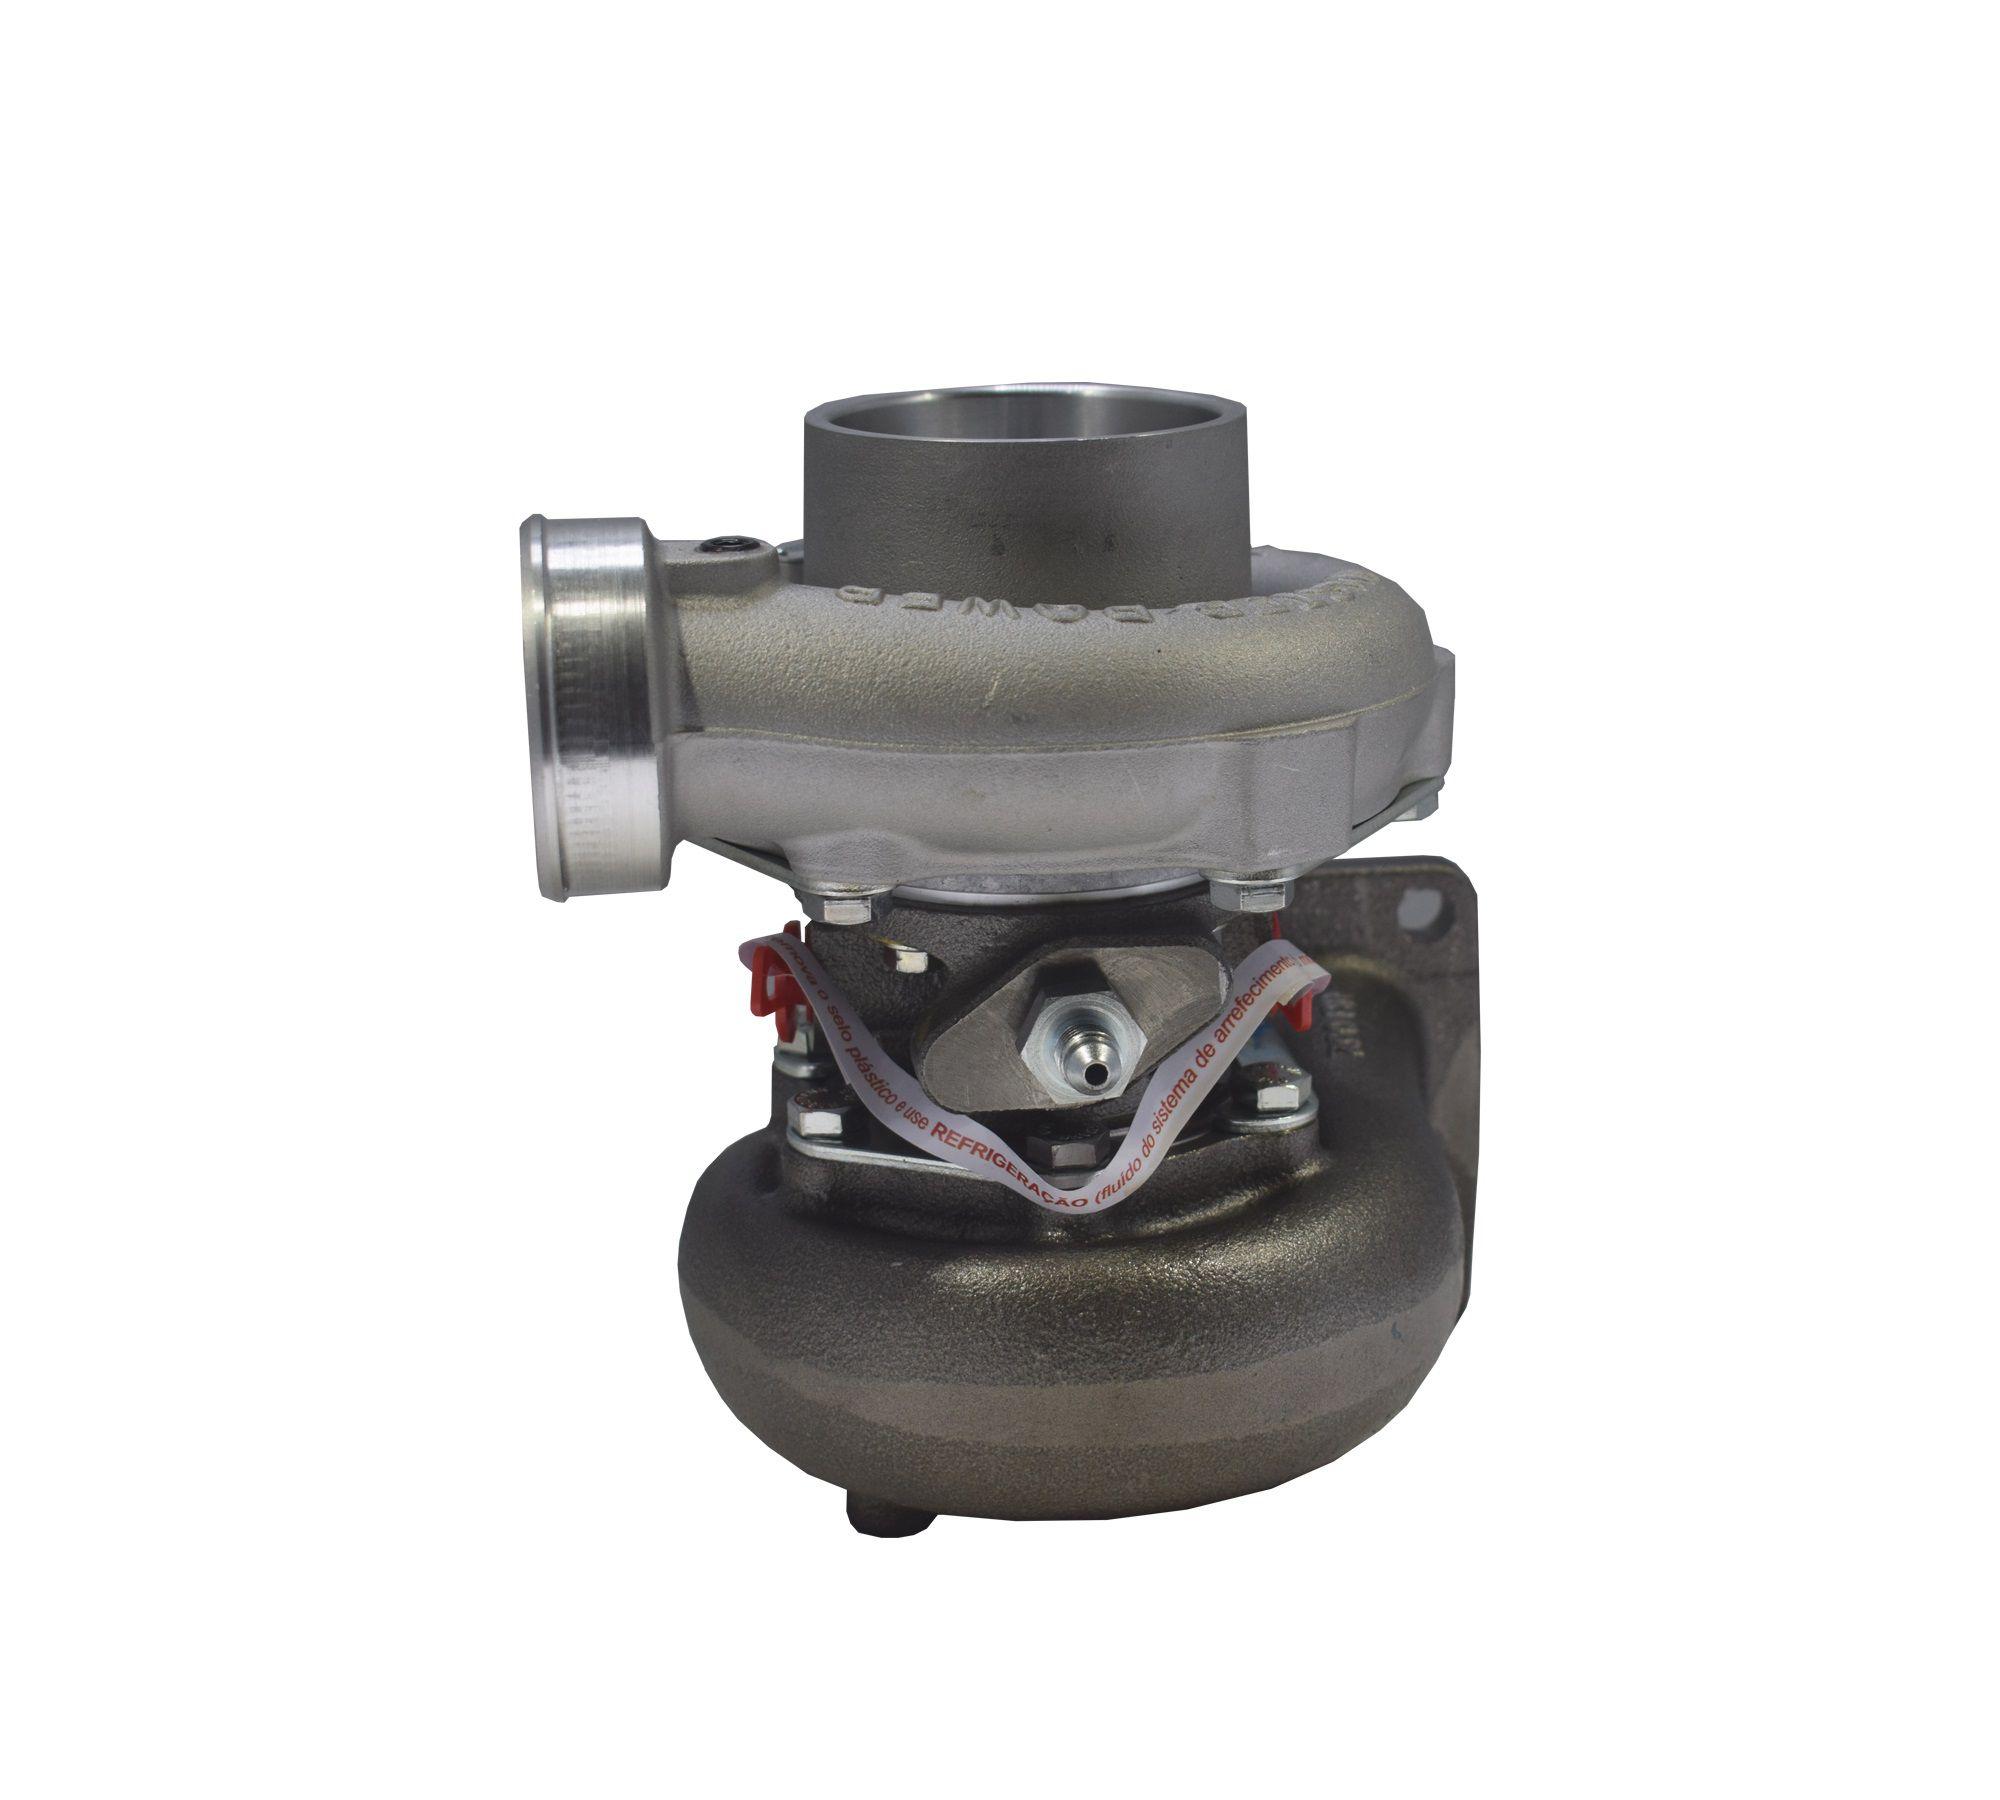 Turbina Roletada / Bearing Master Power - RB 4449 48. Mono (envio 01/08)